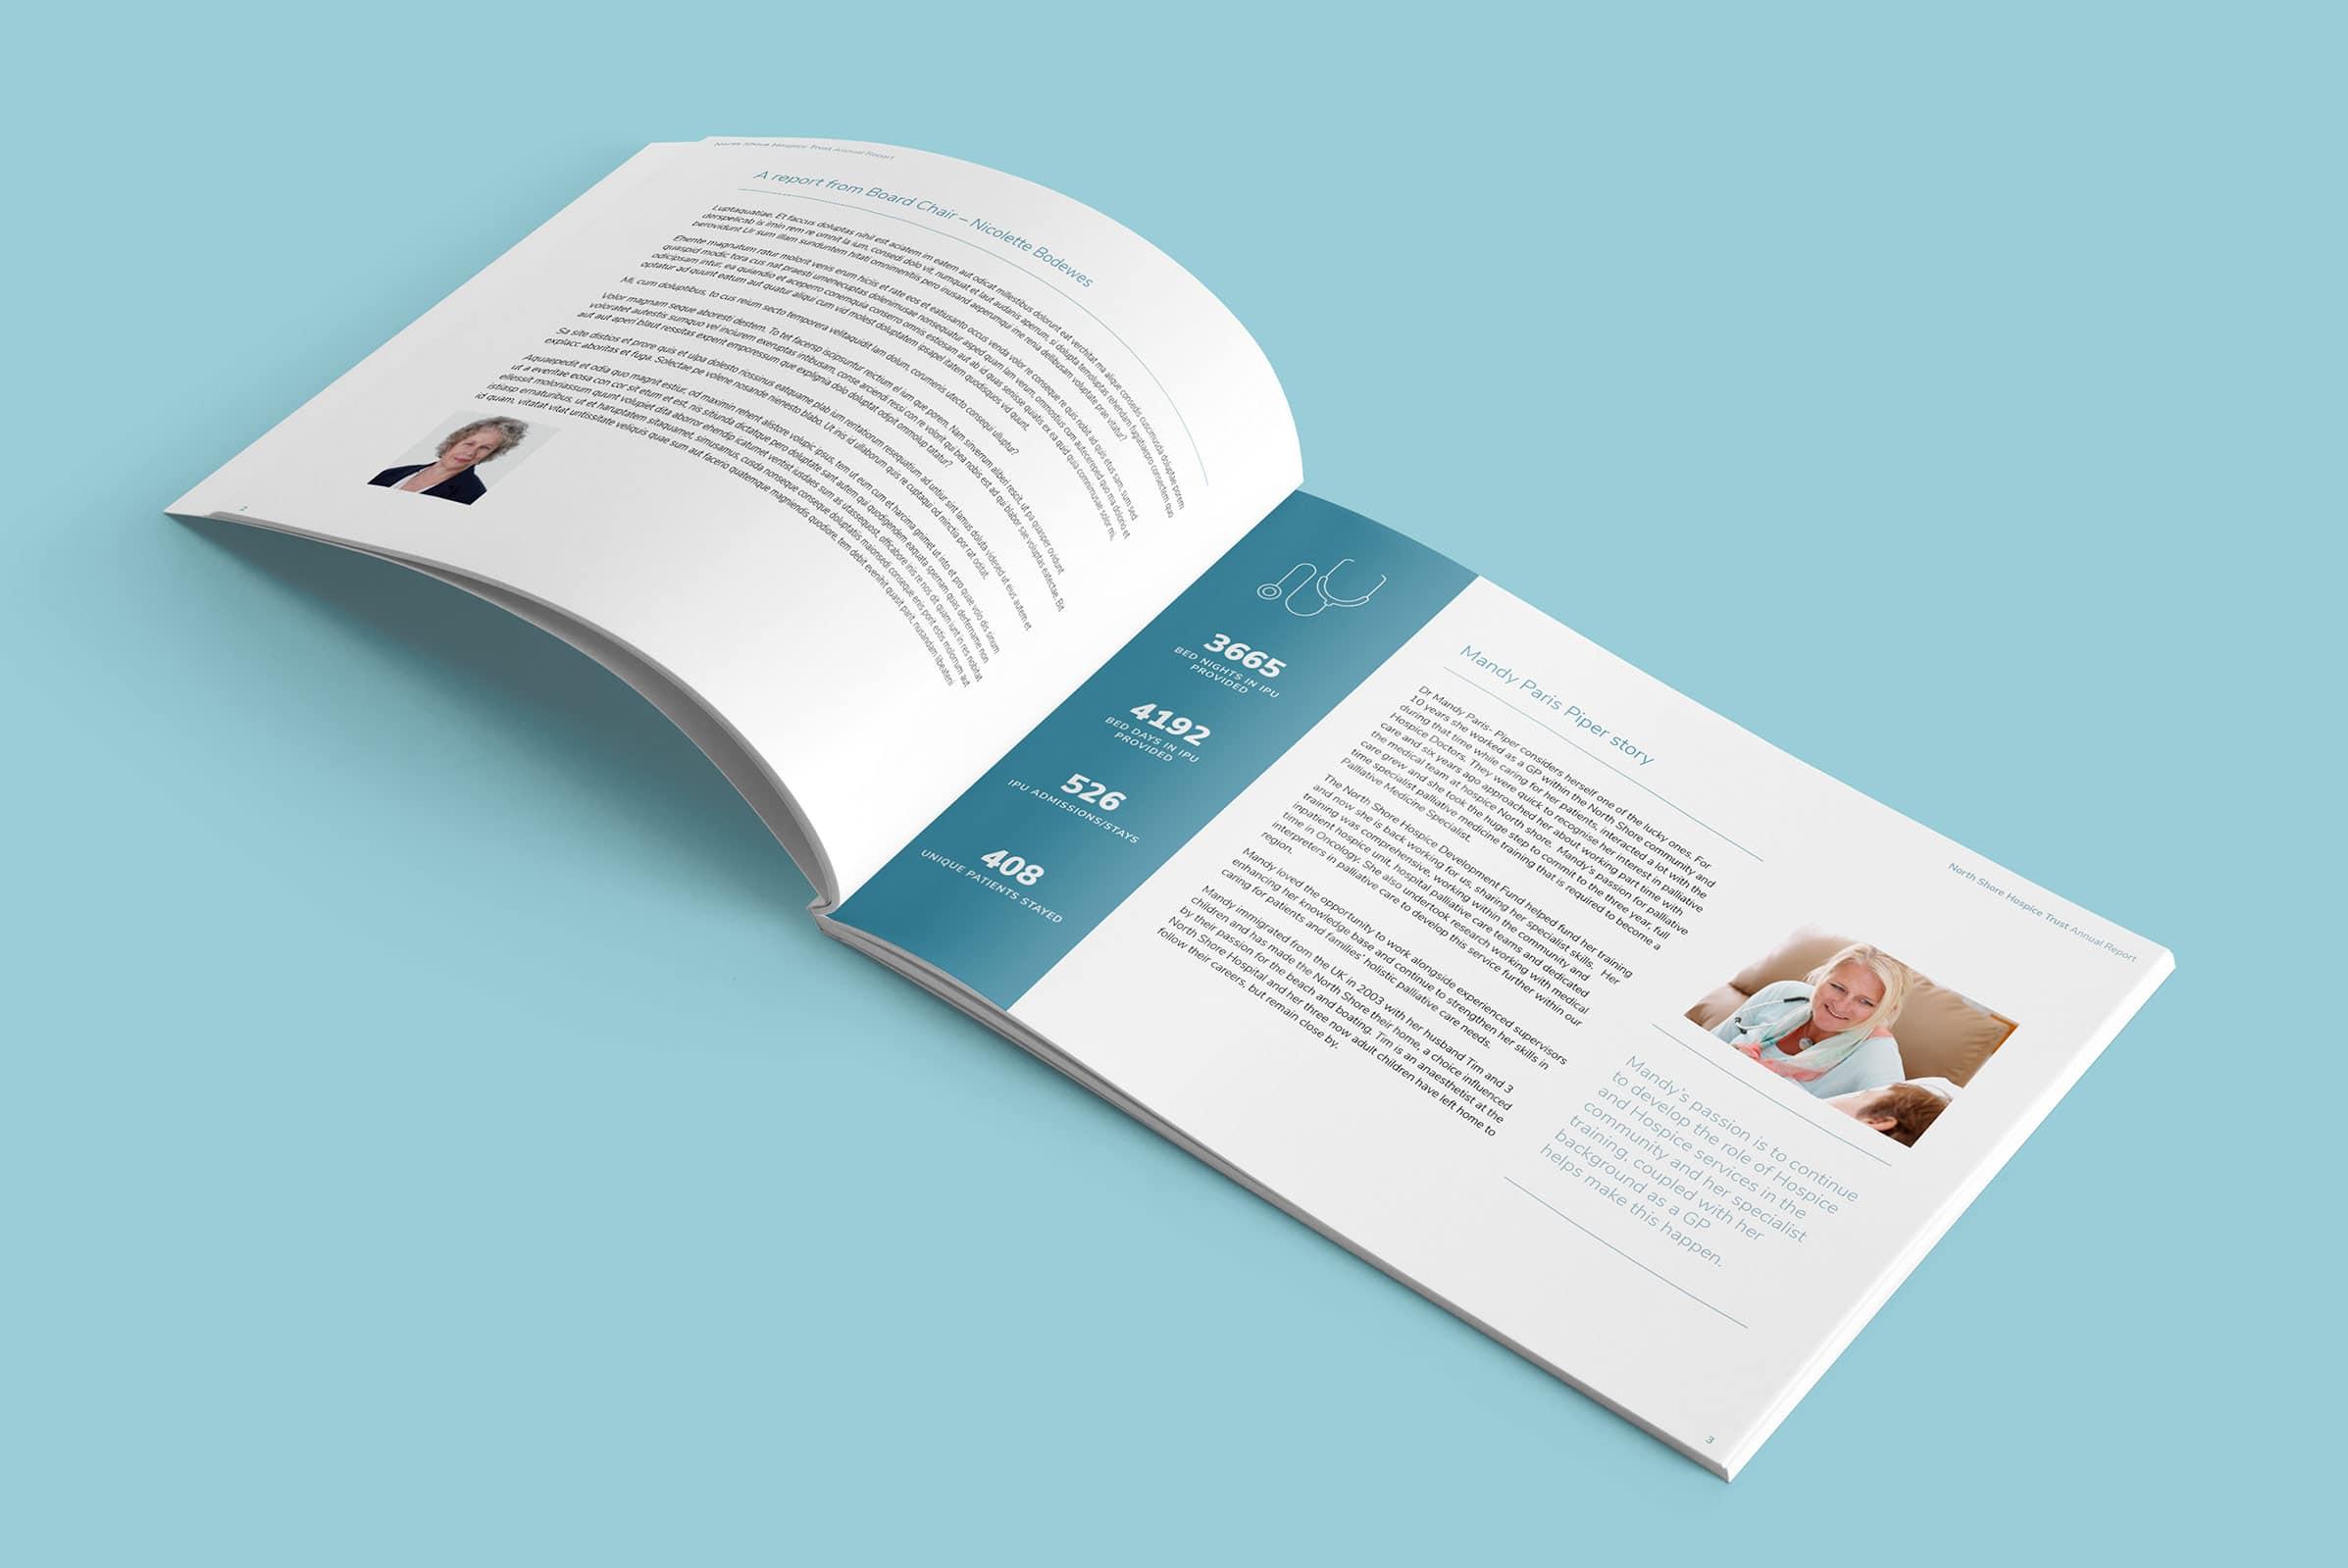 Annual report design for NZ company